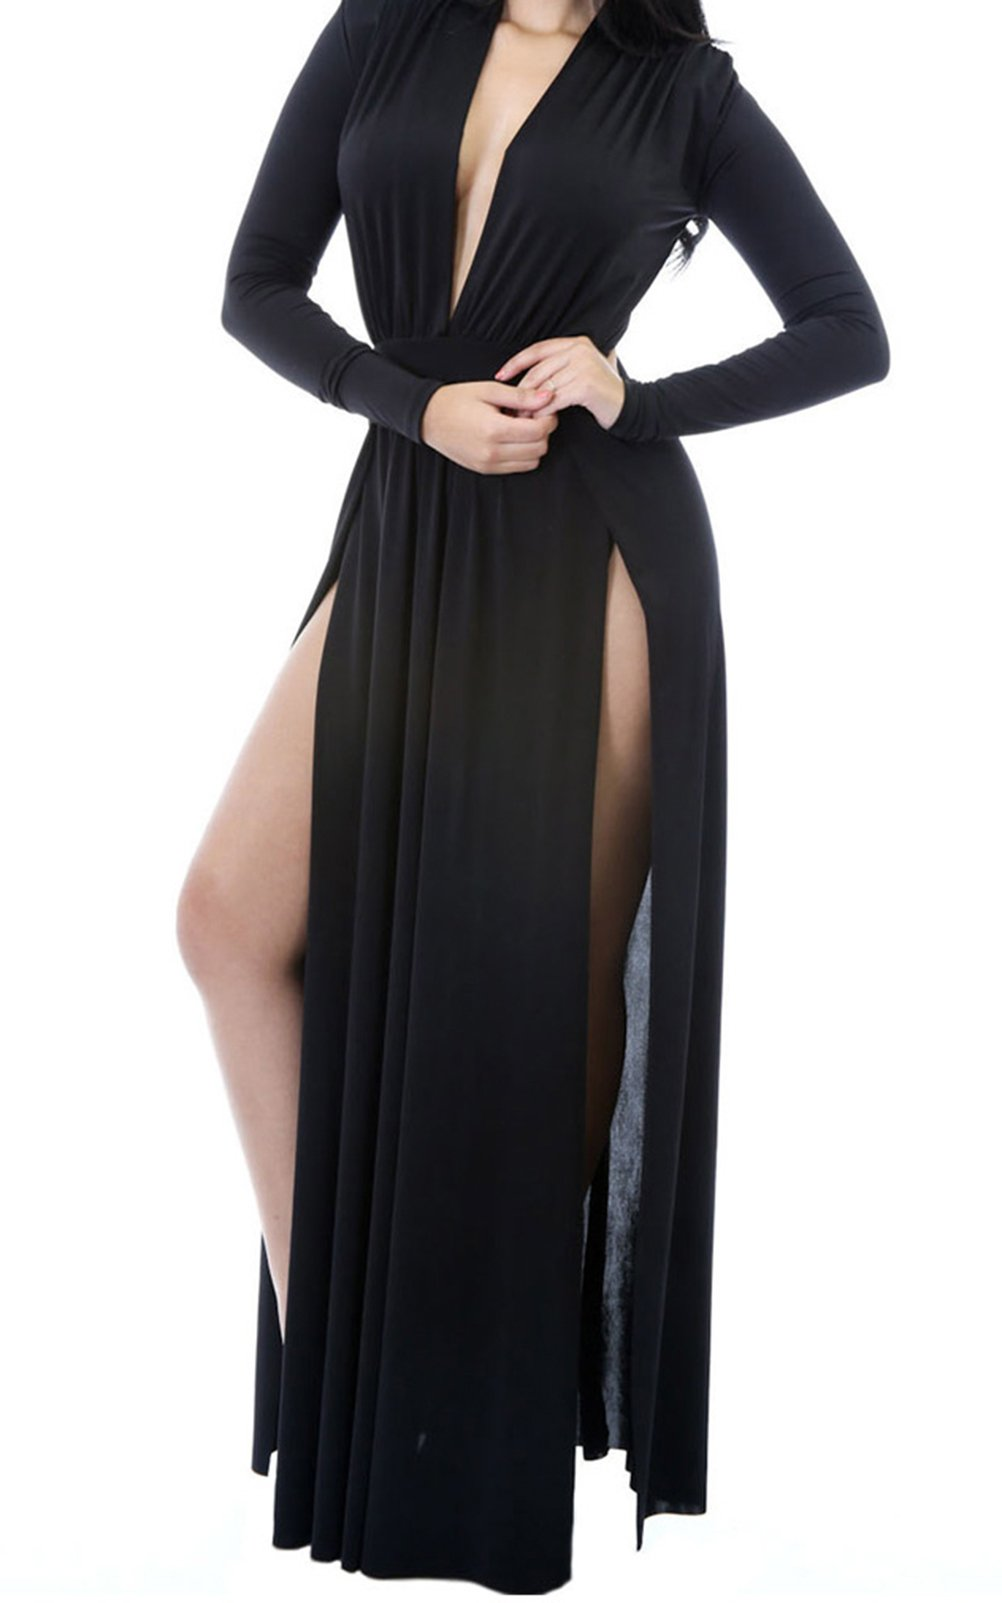 BYY Super Classy Long Sleeves Double Slit Long Maxi Dress(Black,L) by BYY